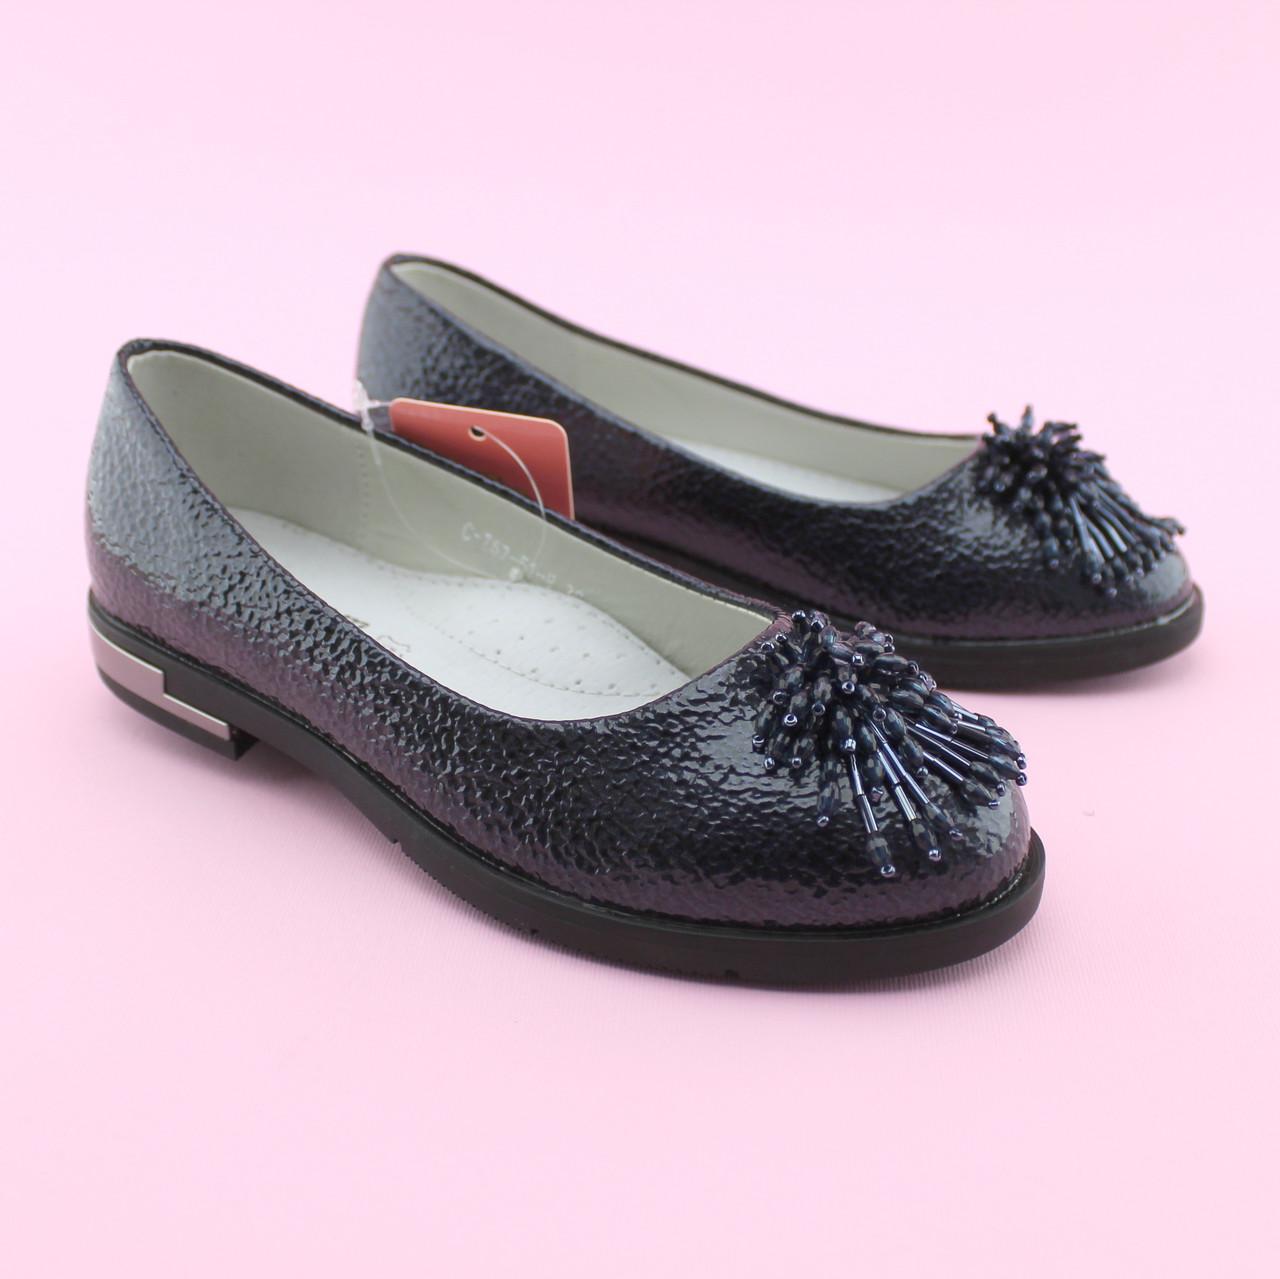 Туфли для девочки синие Лодочка тм Том.М размер 32,34,35,36,37